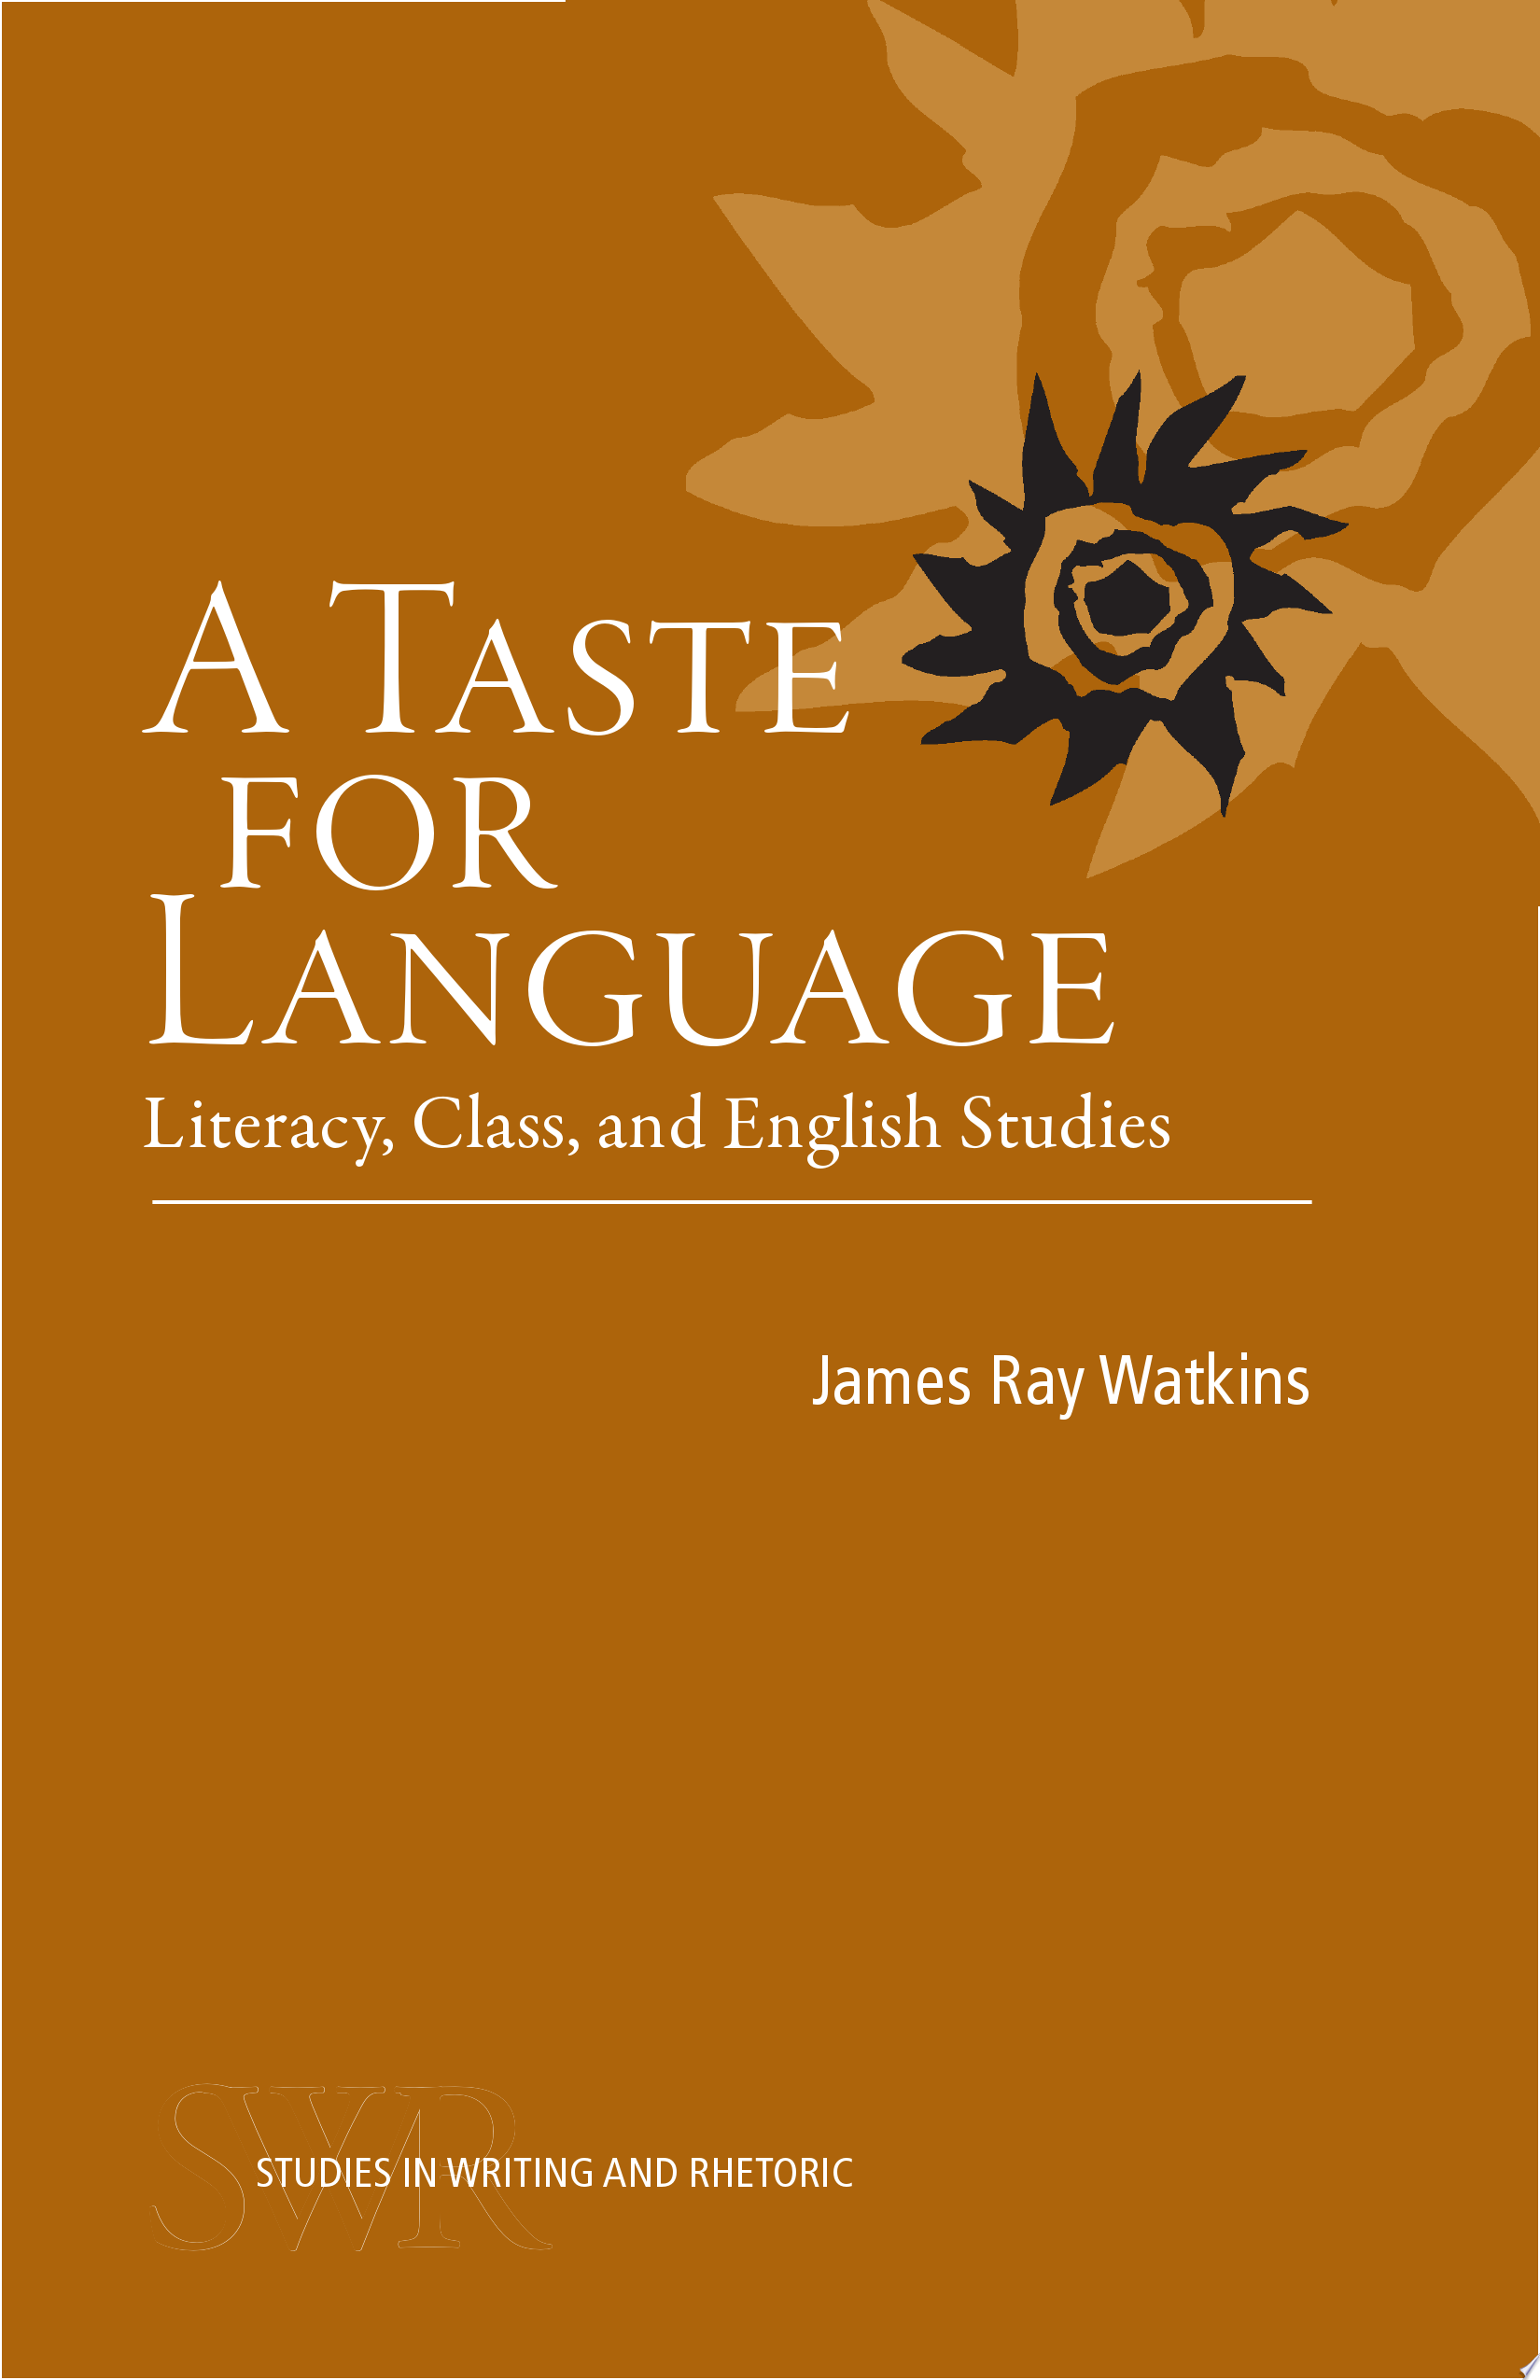 A Taste for Language